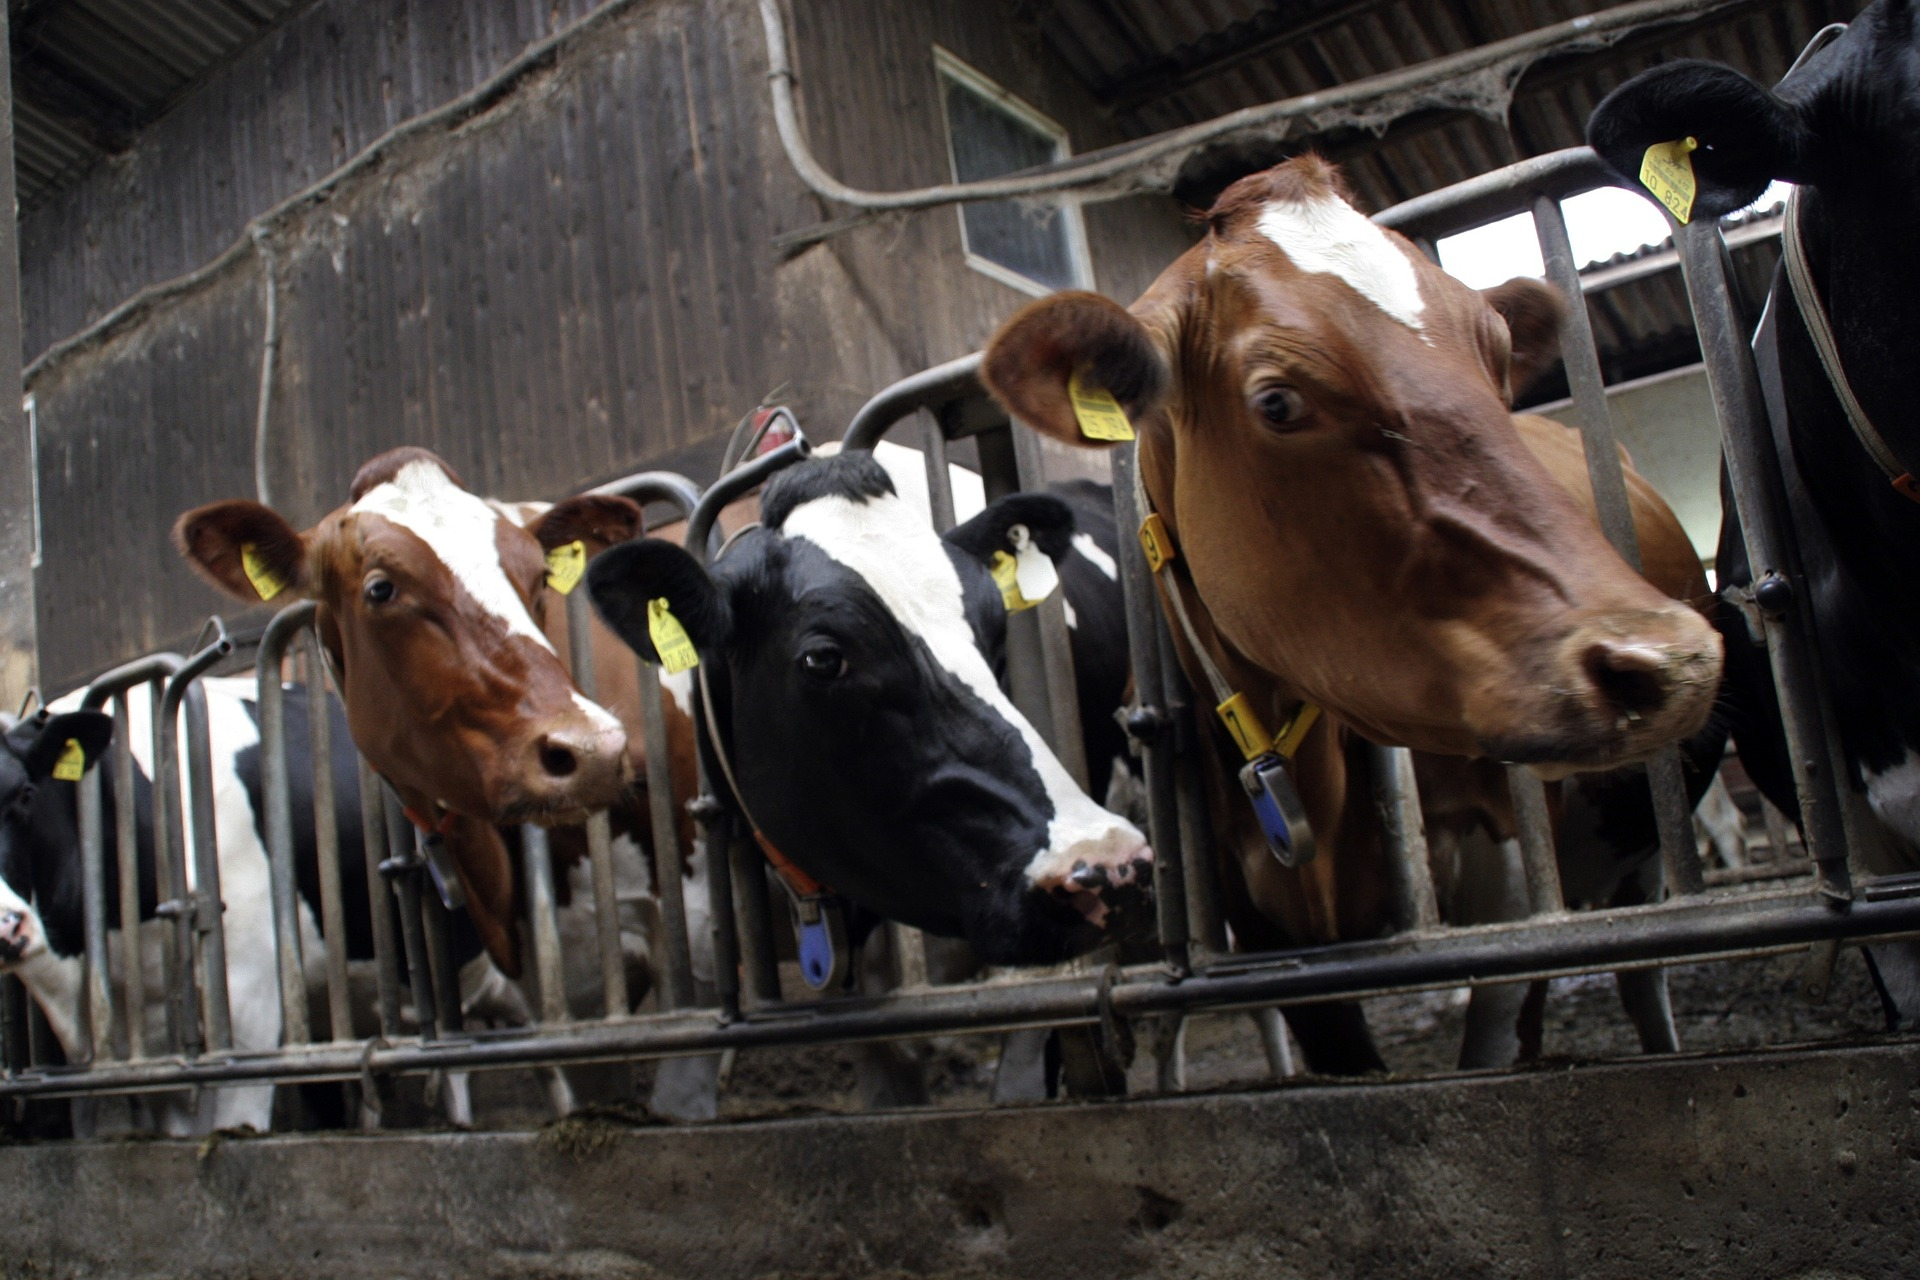 Factory Farm Cows: Image by Fred Lehmann